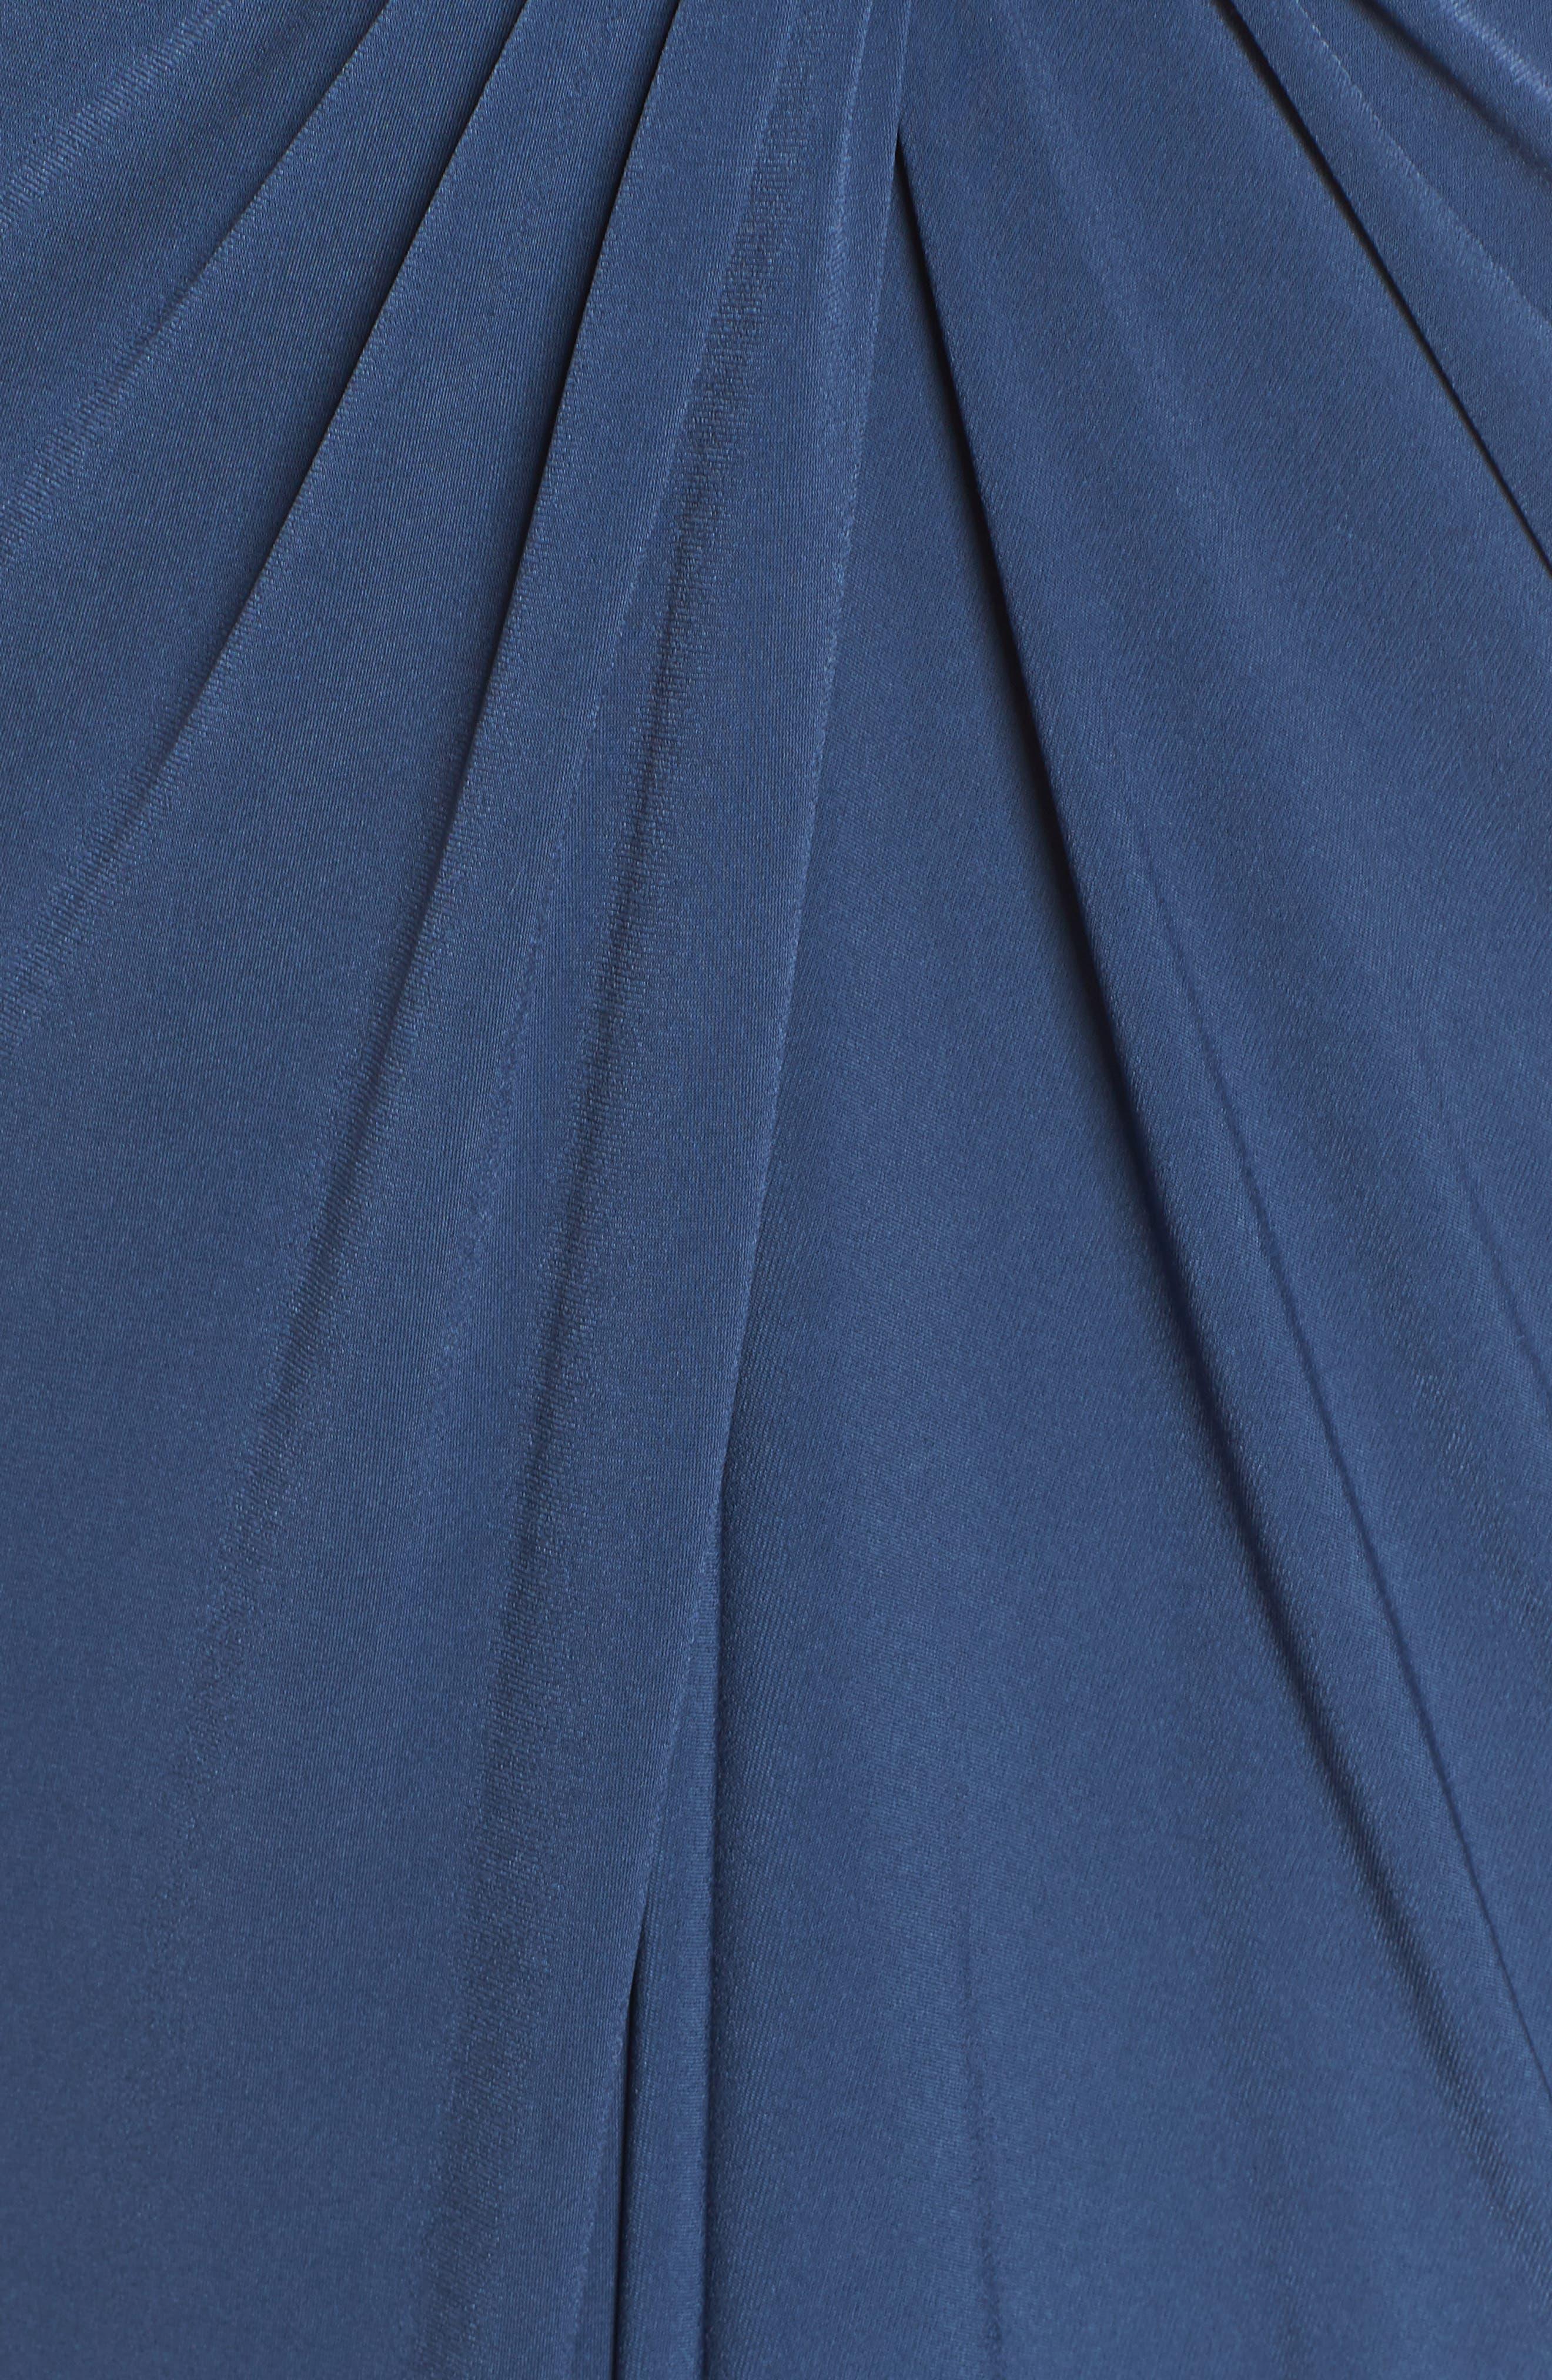 KATIE MAY, Leo Twist Front Evening Dress, Alternate thumbnail 6, color, DEEP SEA